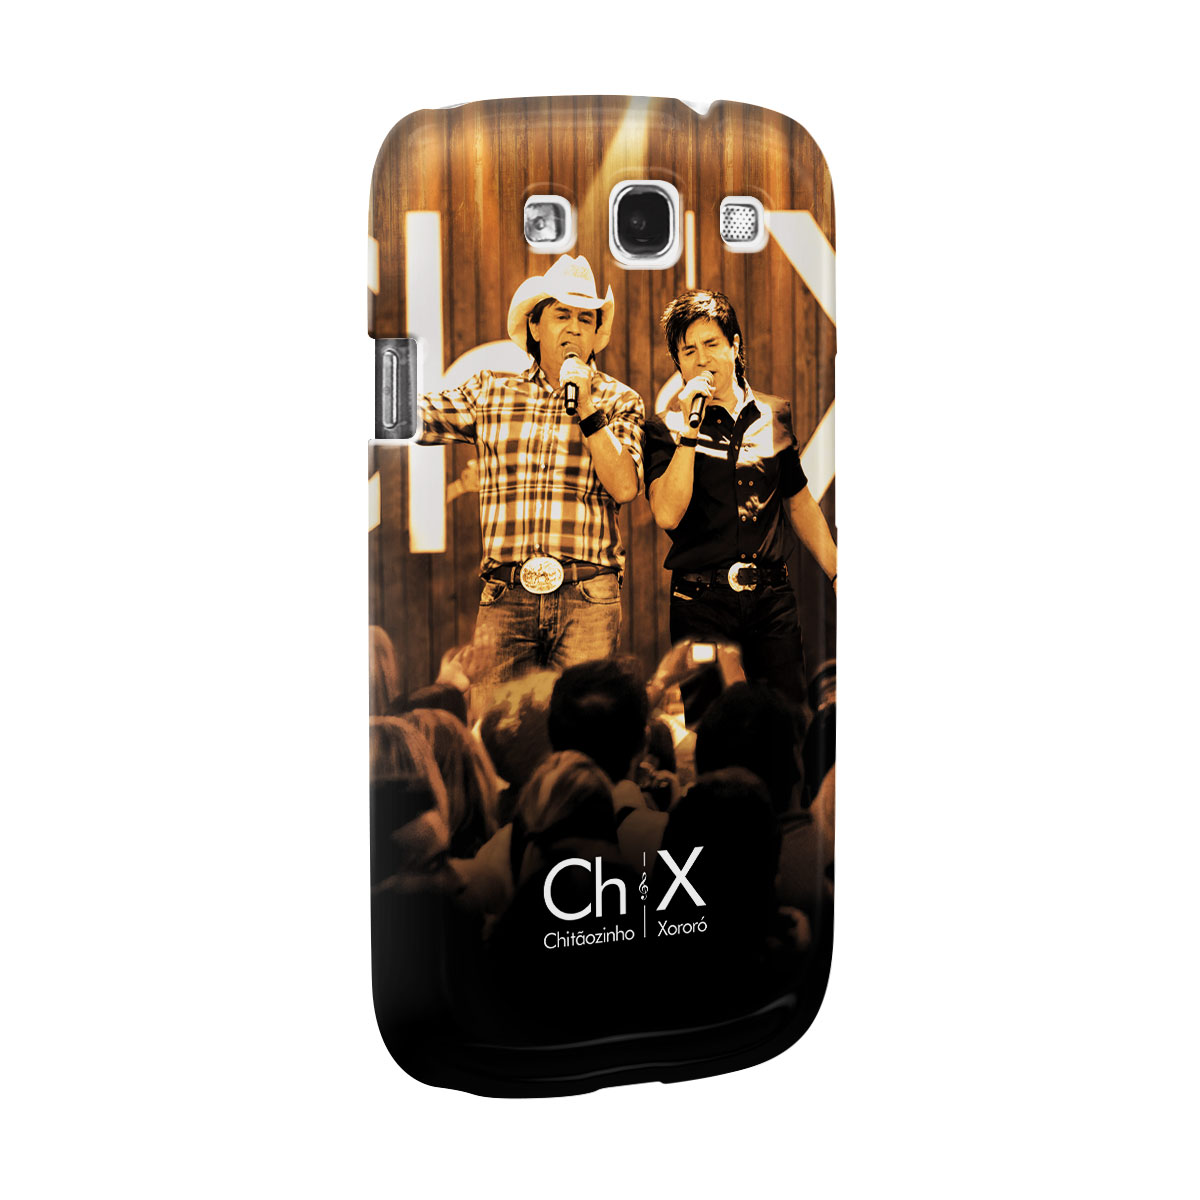 Capa para Samsung Galaxy S3 Chitãozinho & Xororó Show